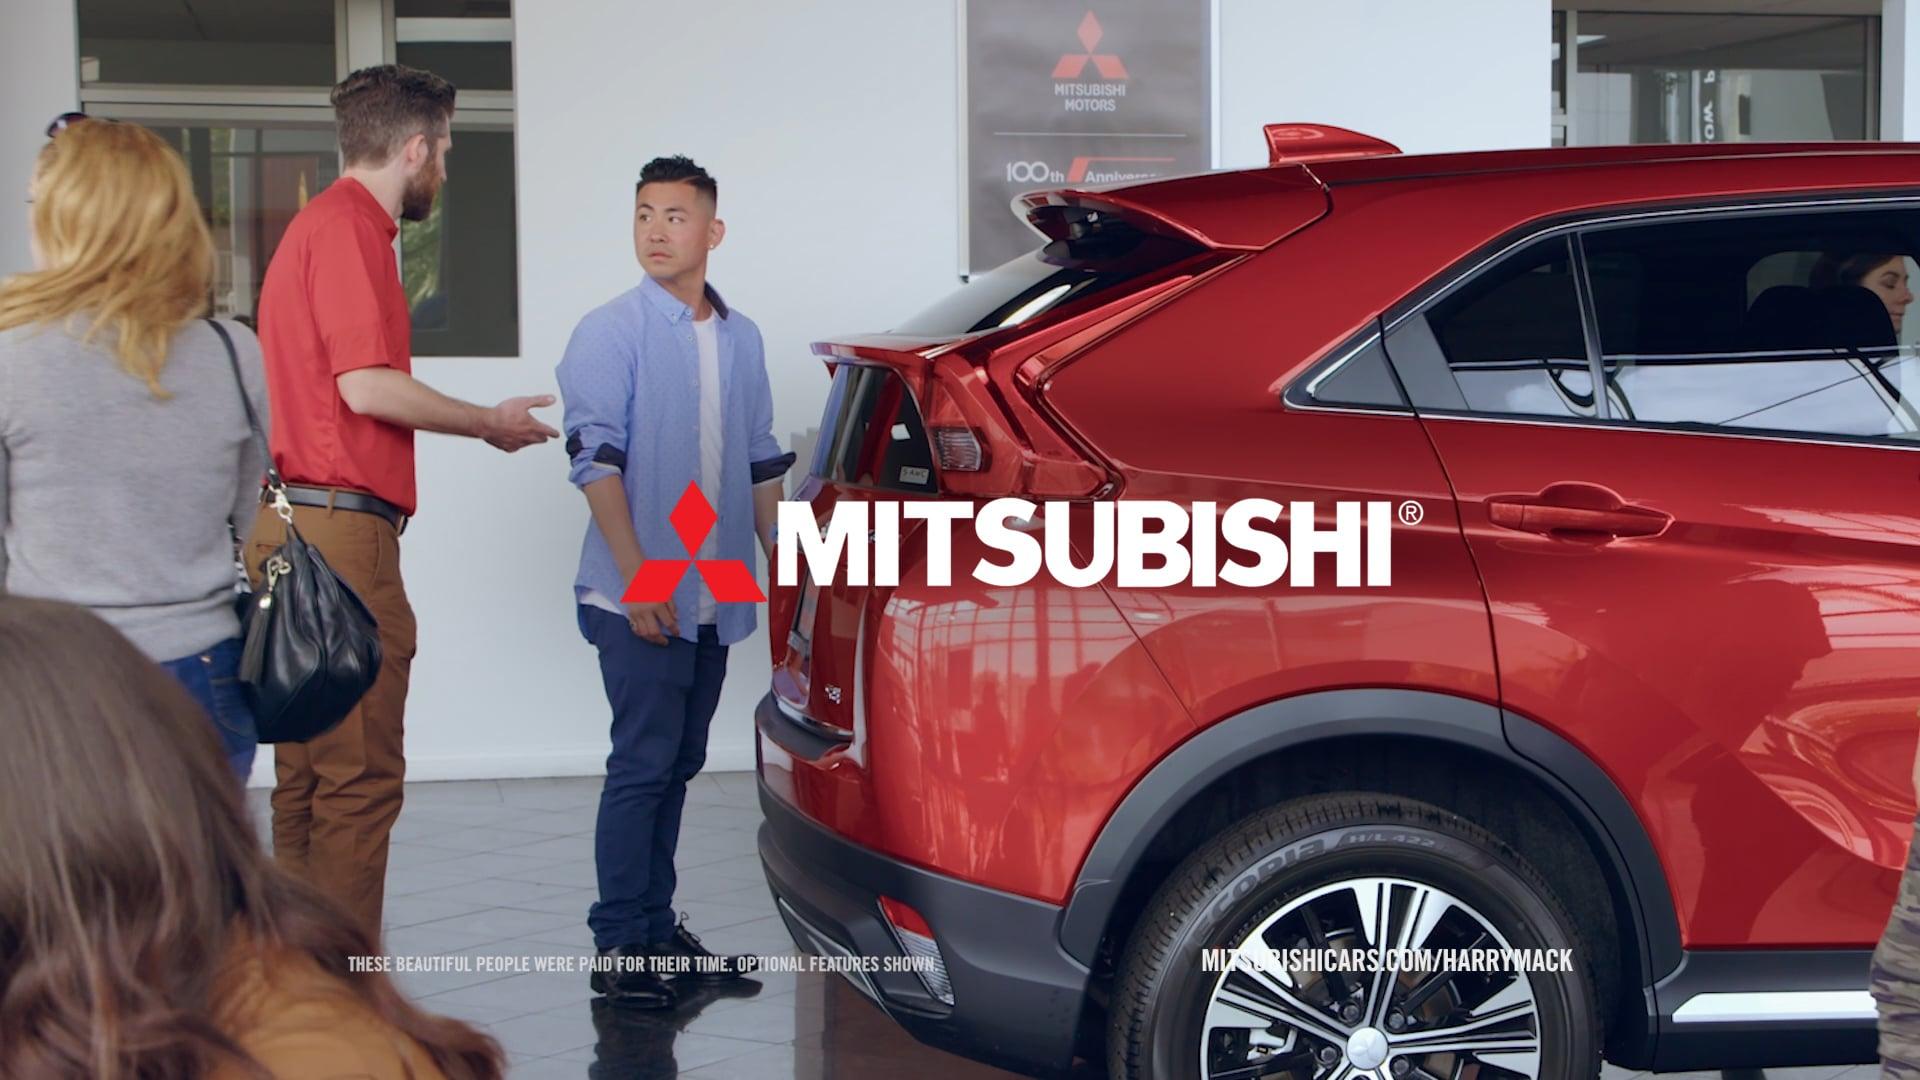 """Freestyle Test Drive"" TV Spot - Mitsubishi"